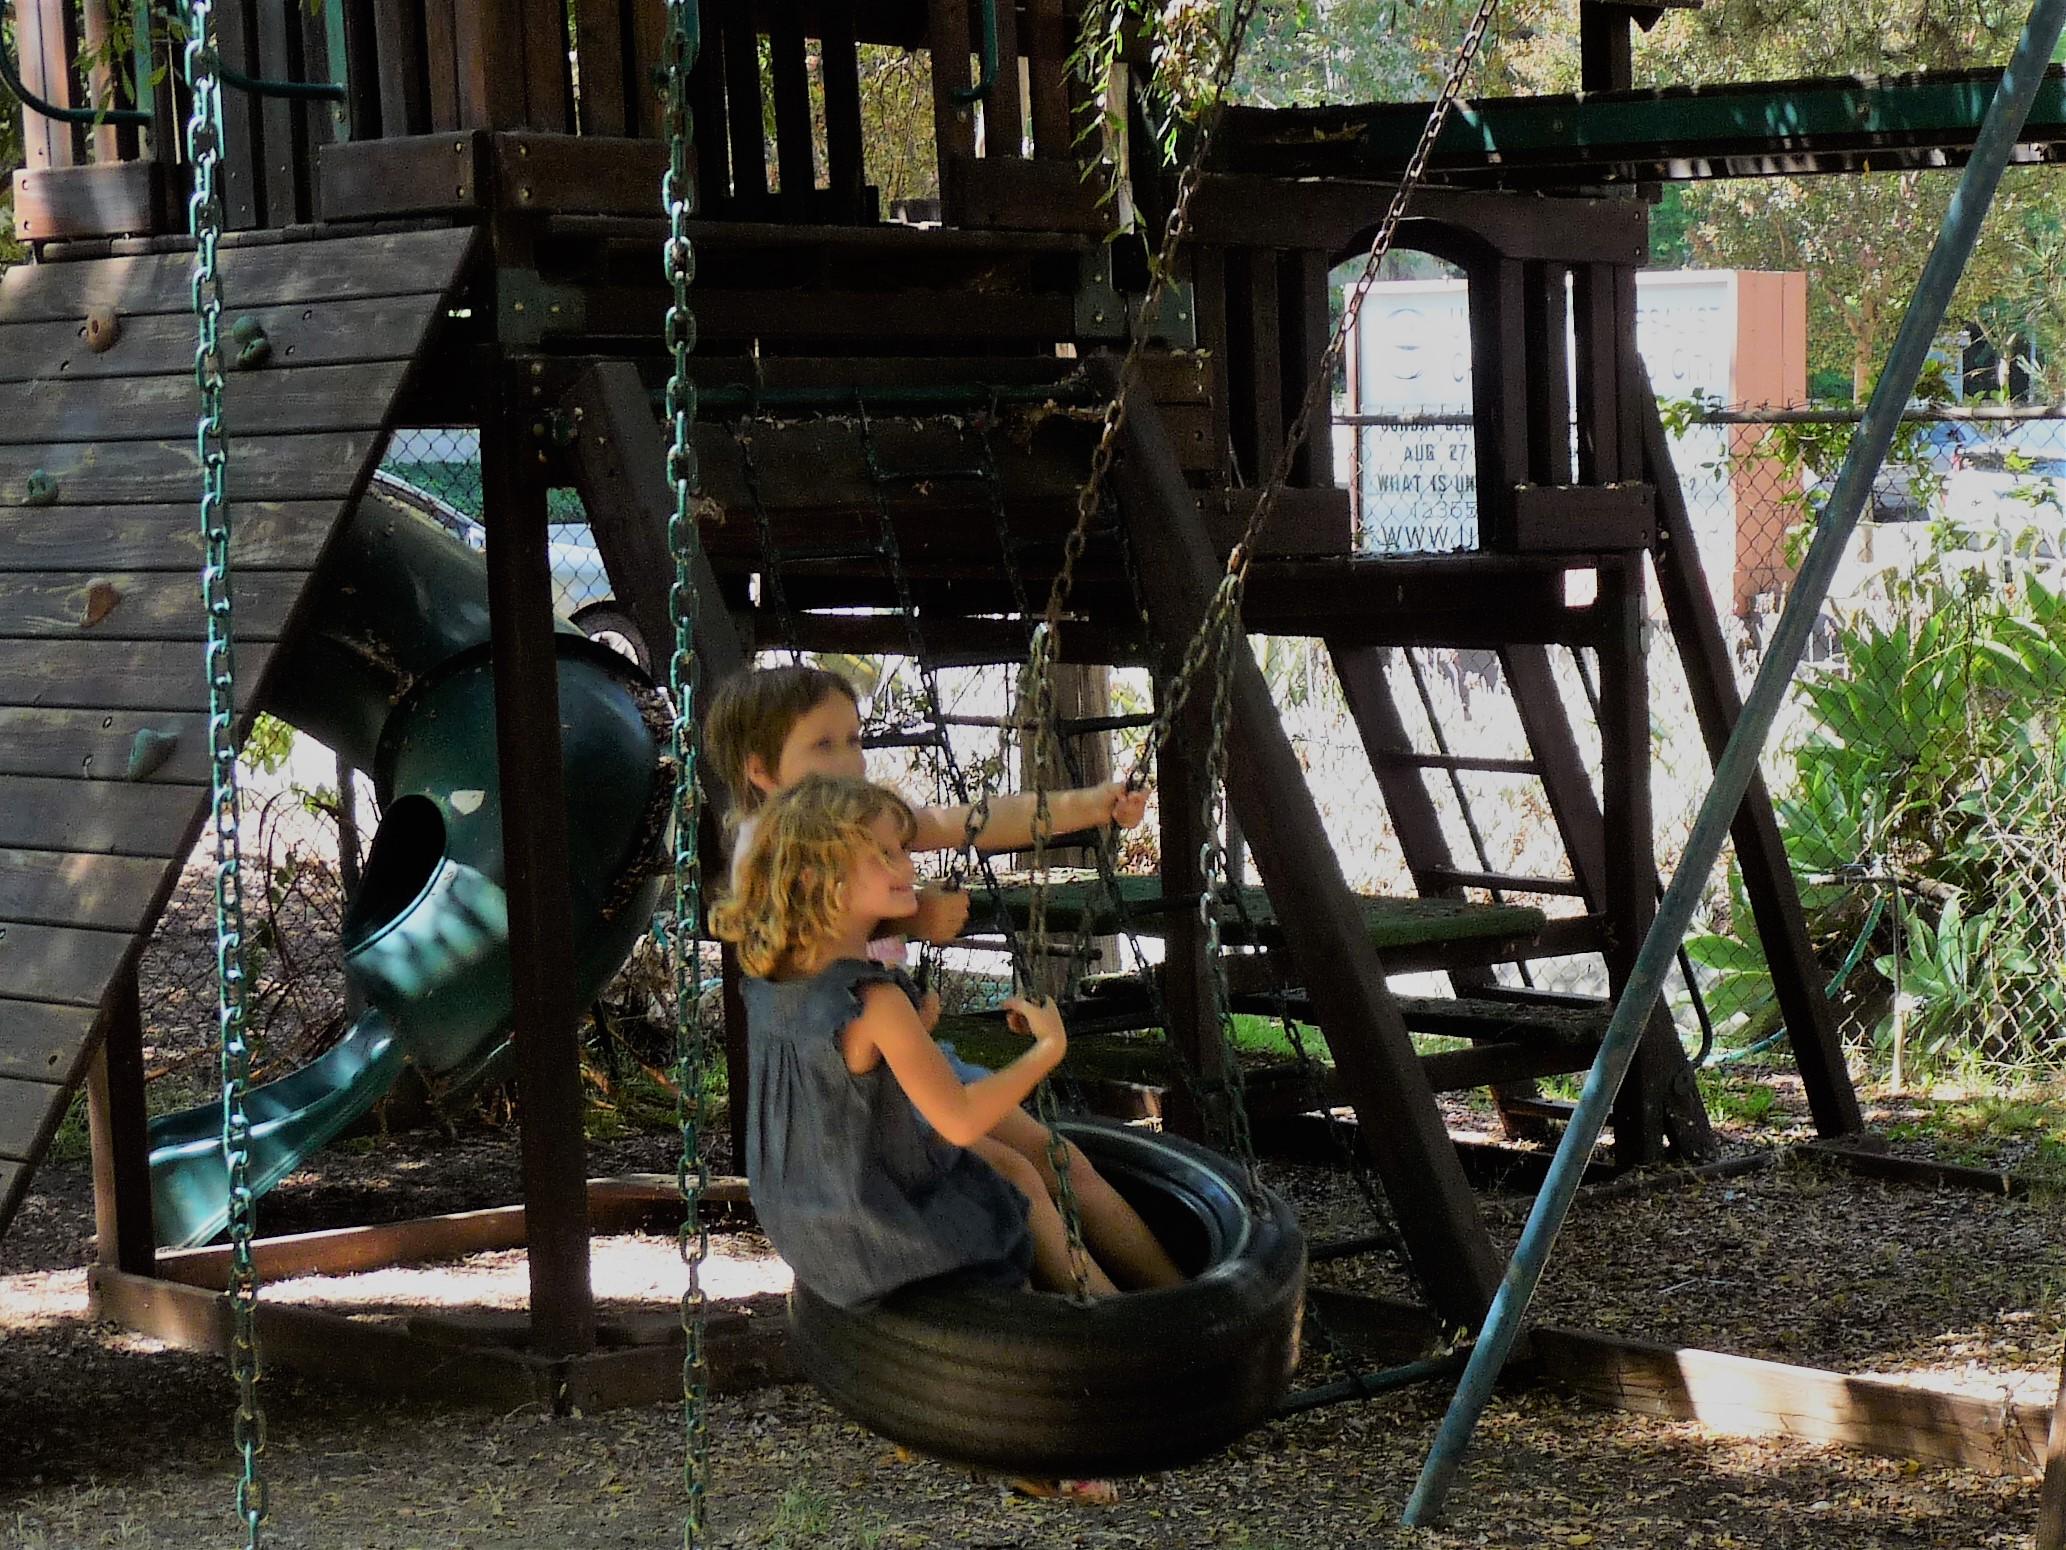 UUCSC Playground